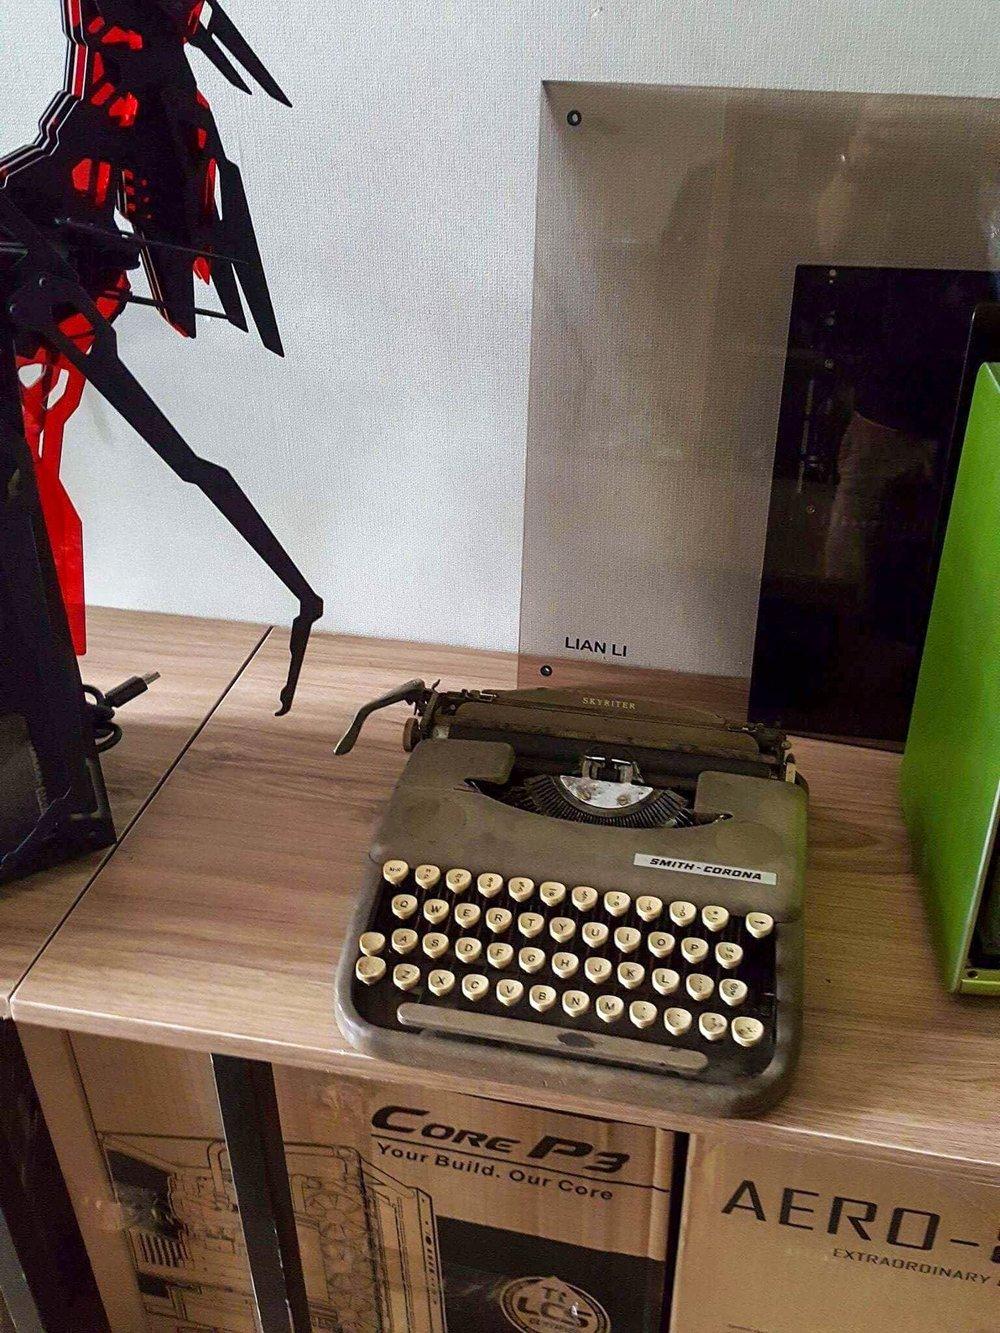 jellykey-typewriter-artisan-keycap-3-2.jpg